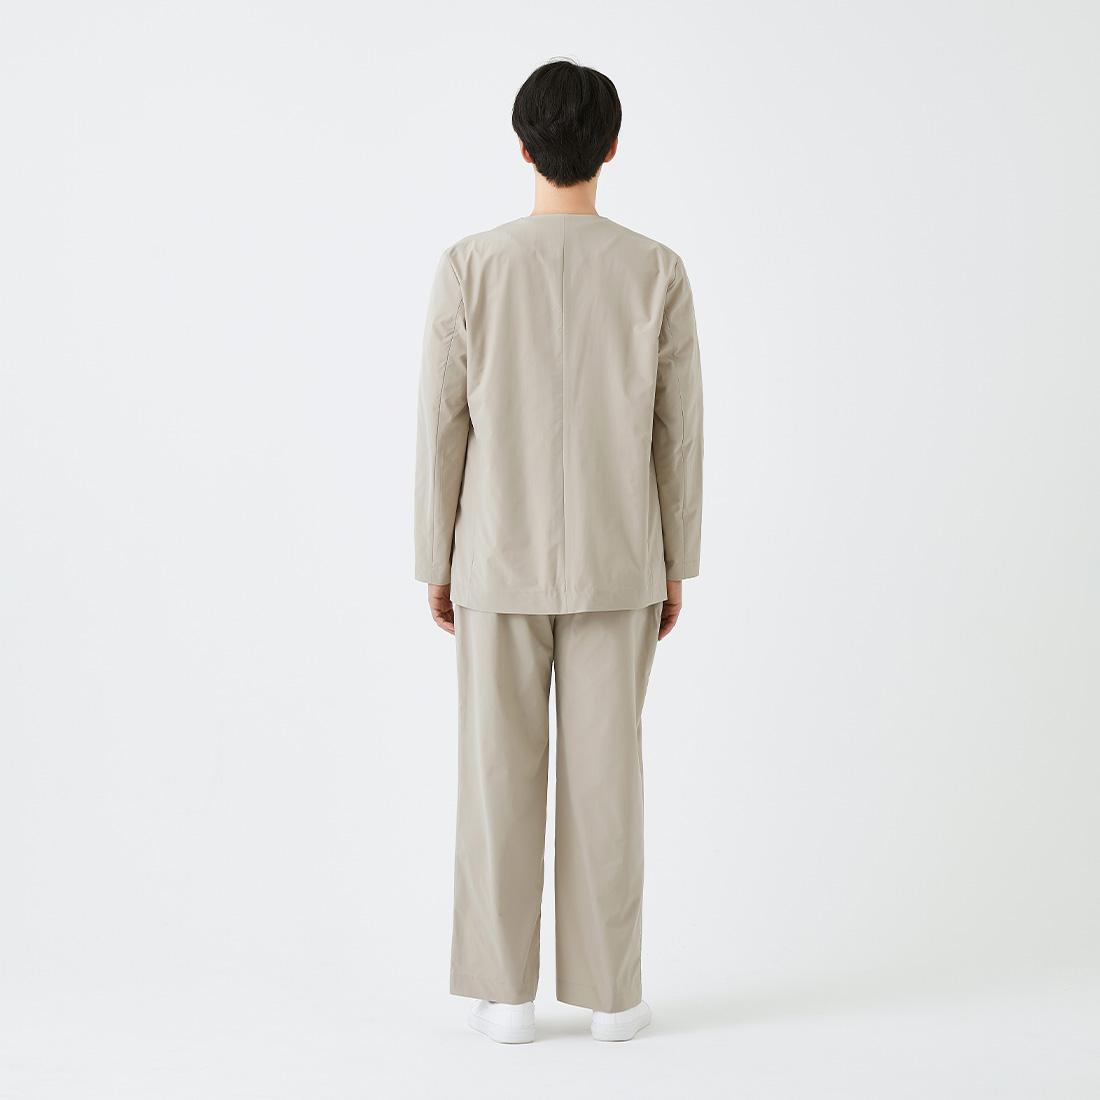 borderless no-collar jacket -male-の商品写真18